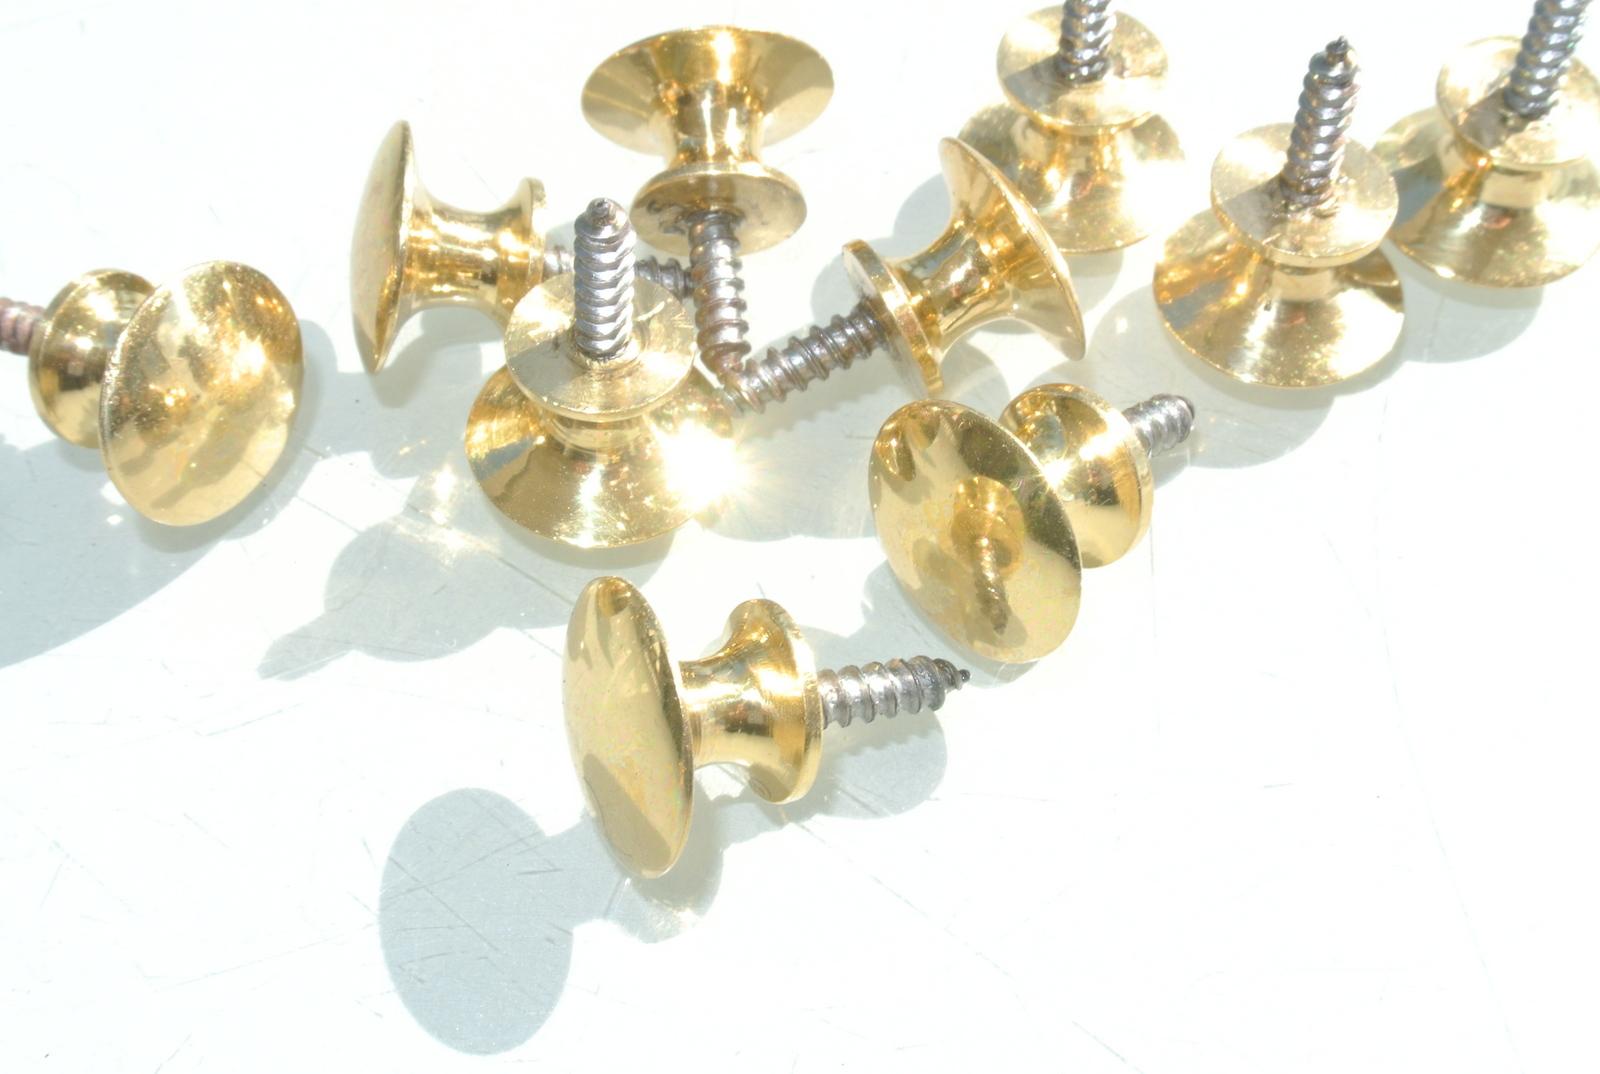 10 Very Tiny Screw Knobs Pulls Handles Antique Solid Heavy